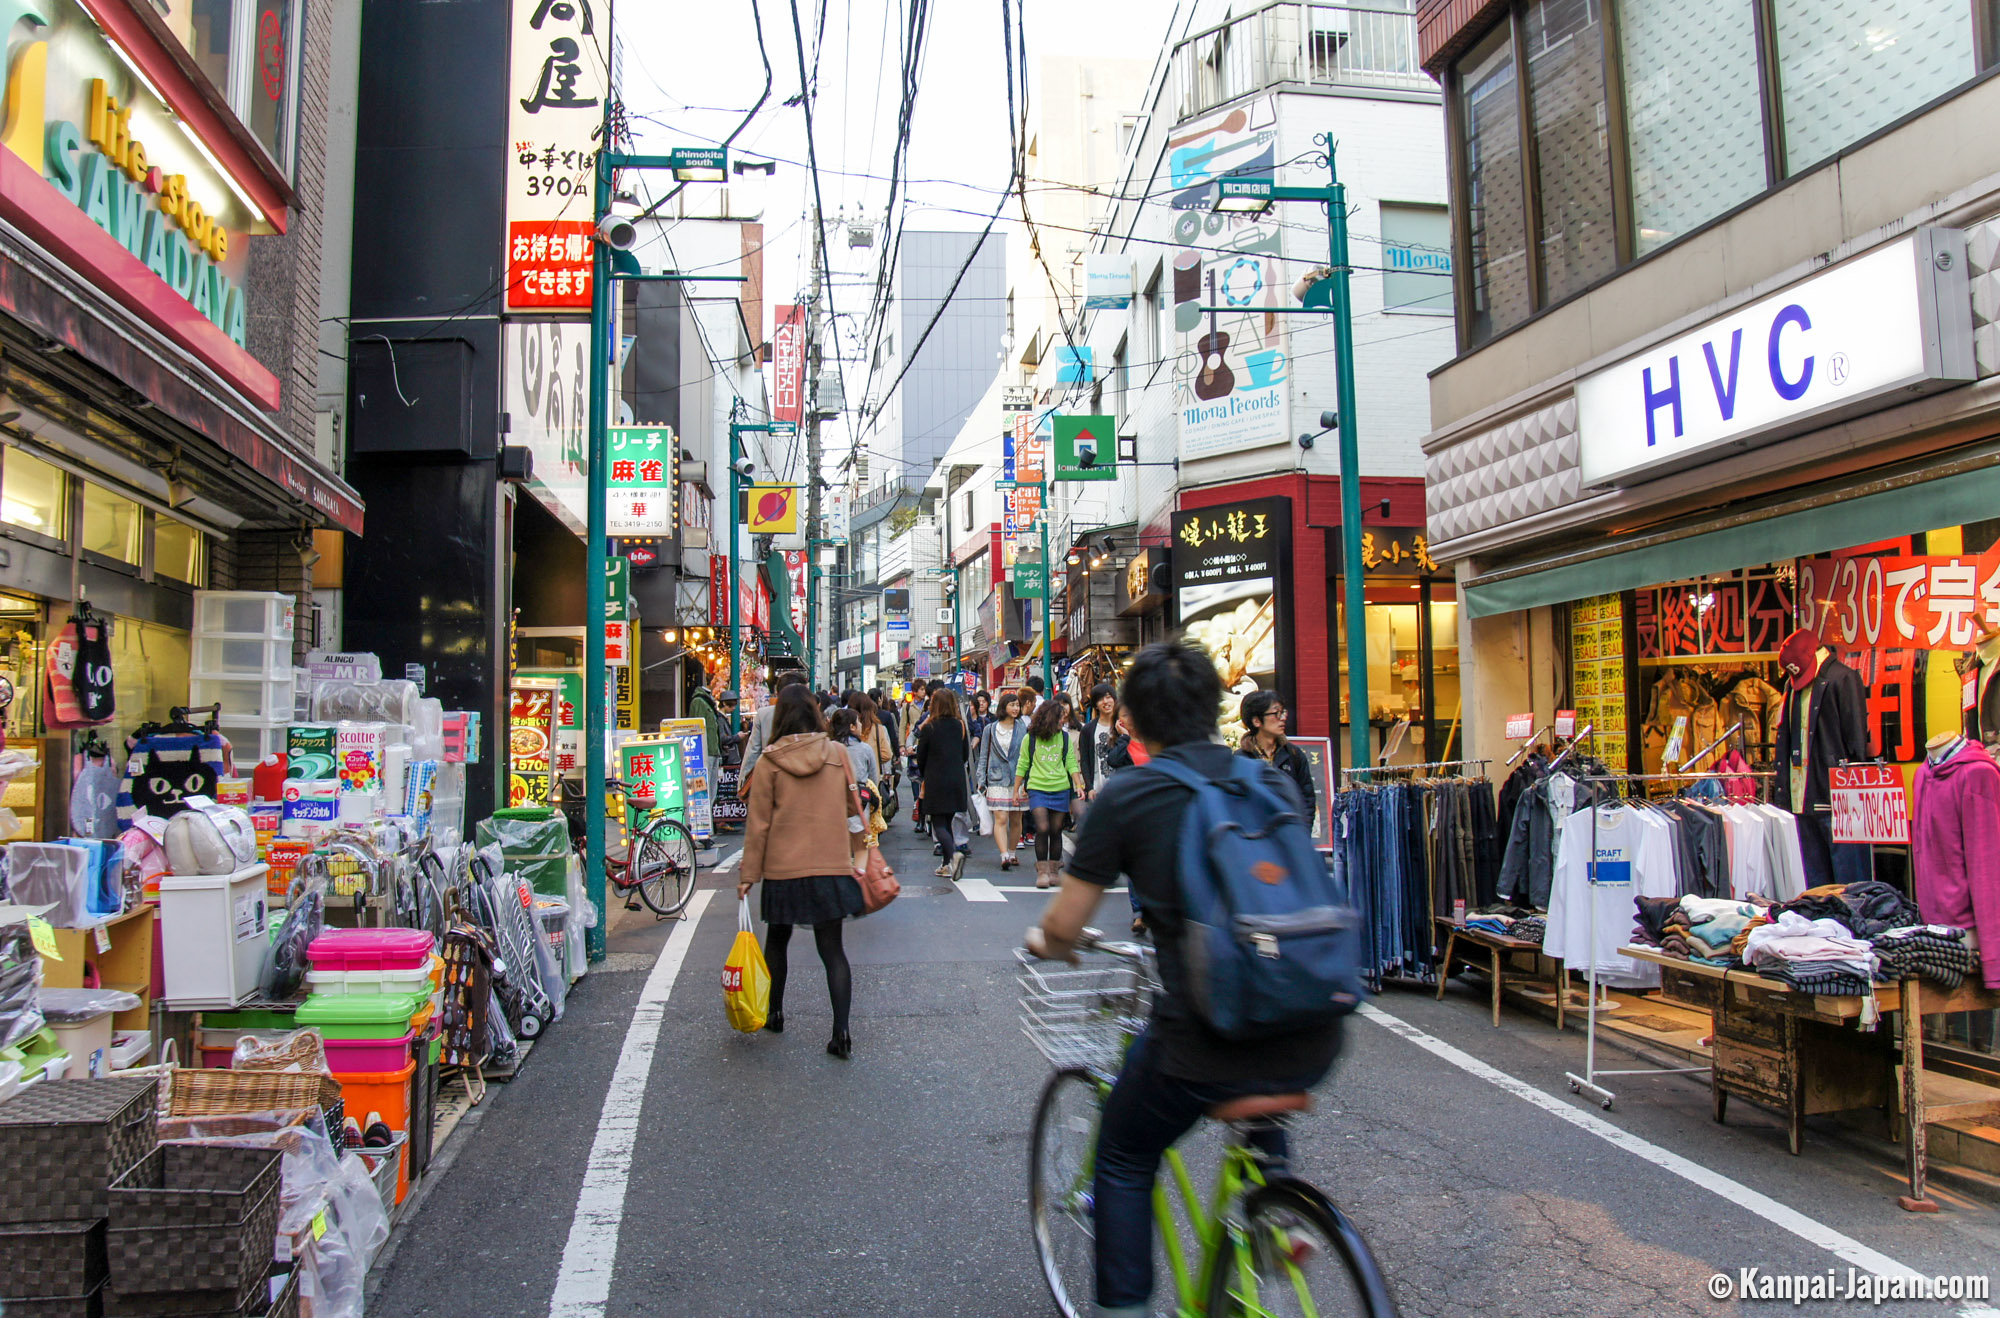 Shimokitazawa The Hipster District Of Tokyo